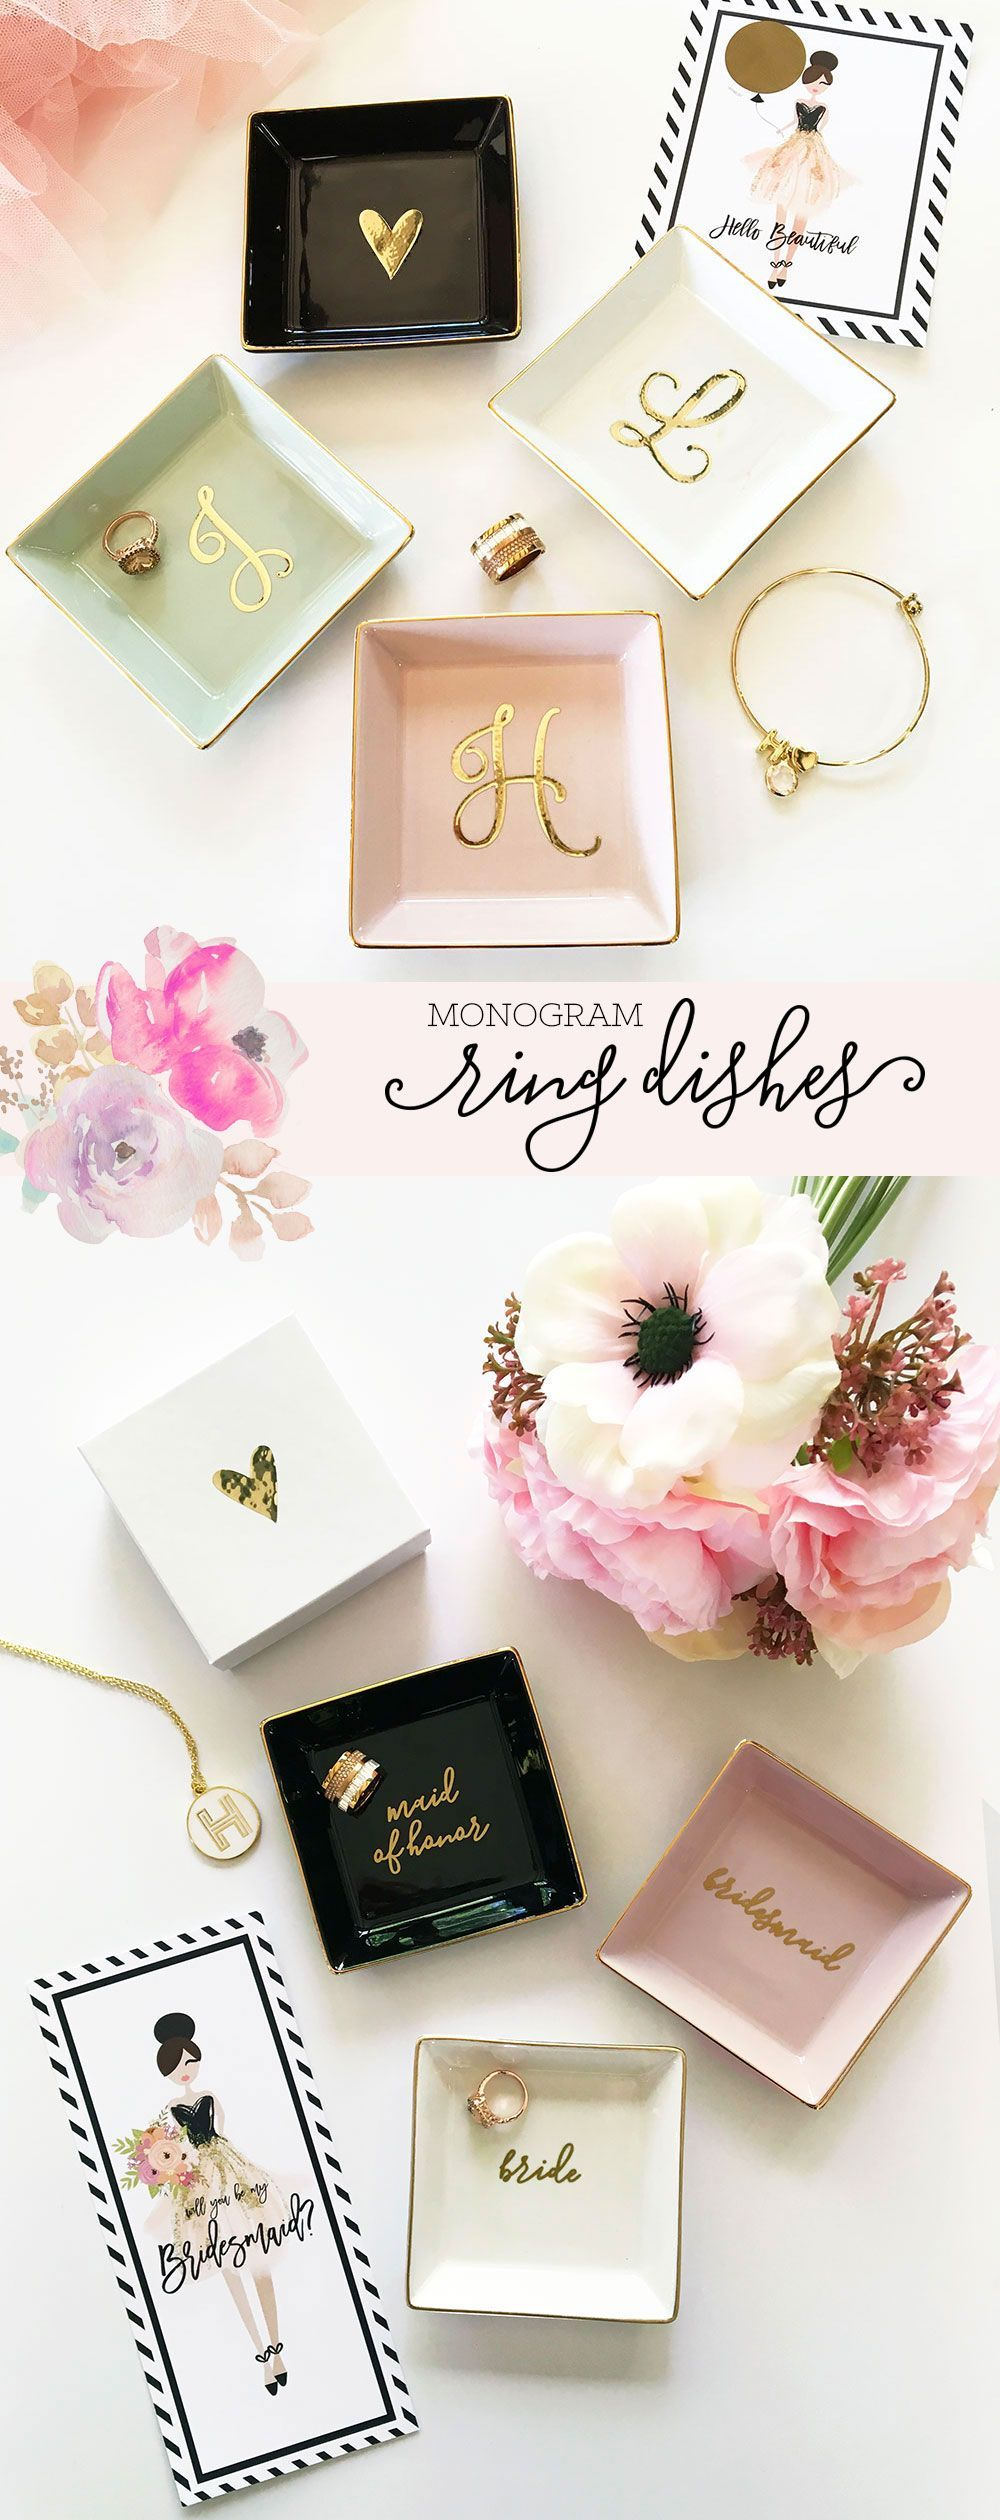 Script Monogram Ring Dish | Wedding jewelry, Luxury bridesmaid gifts ...